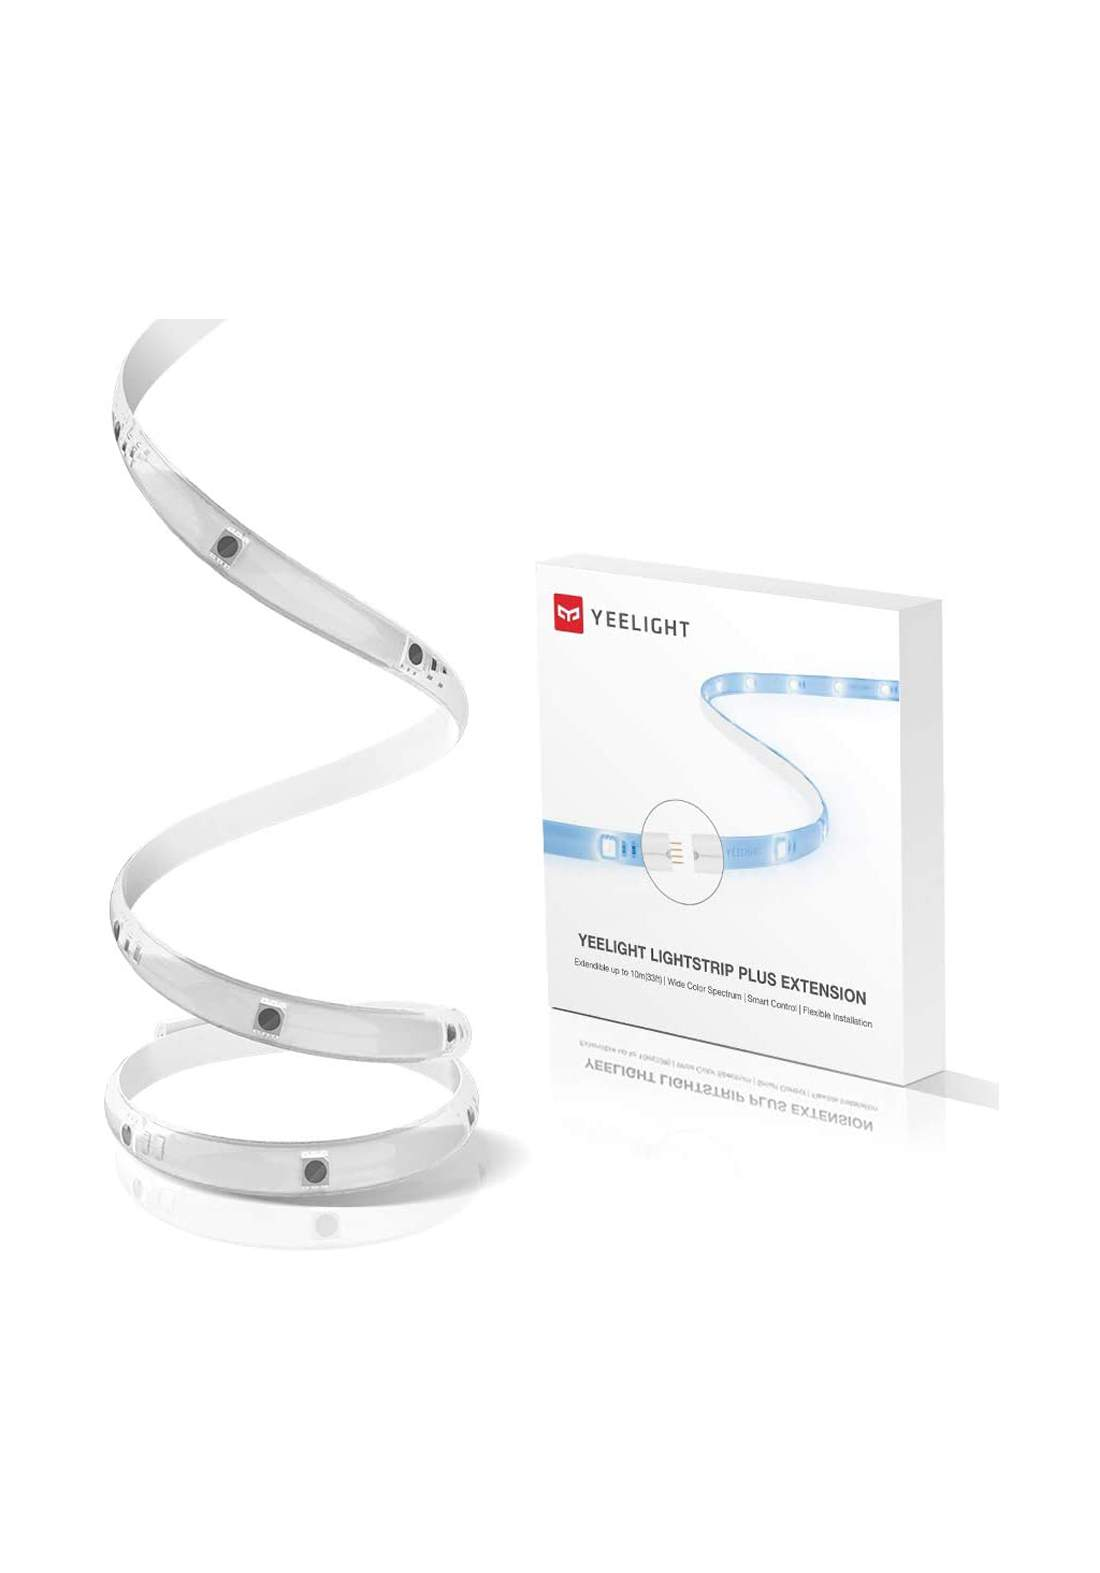 Yeelight Xiaomi  Lightstrip Plus Extension - White  شريط مصباح